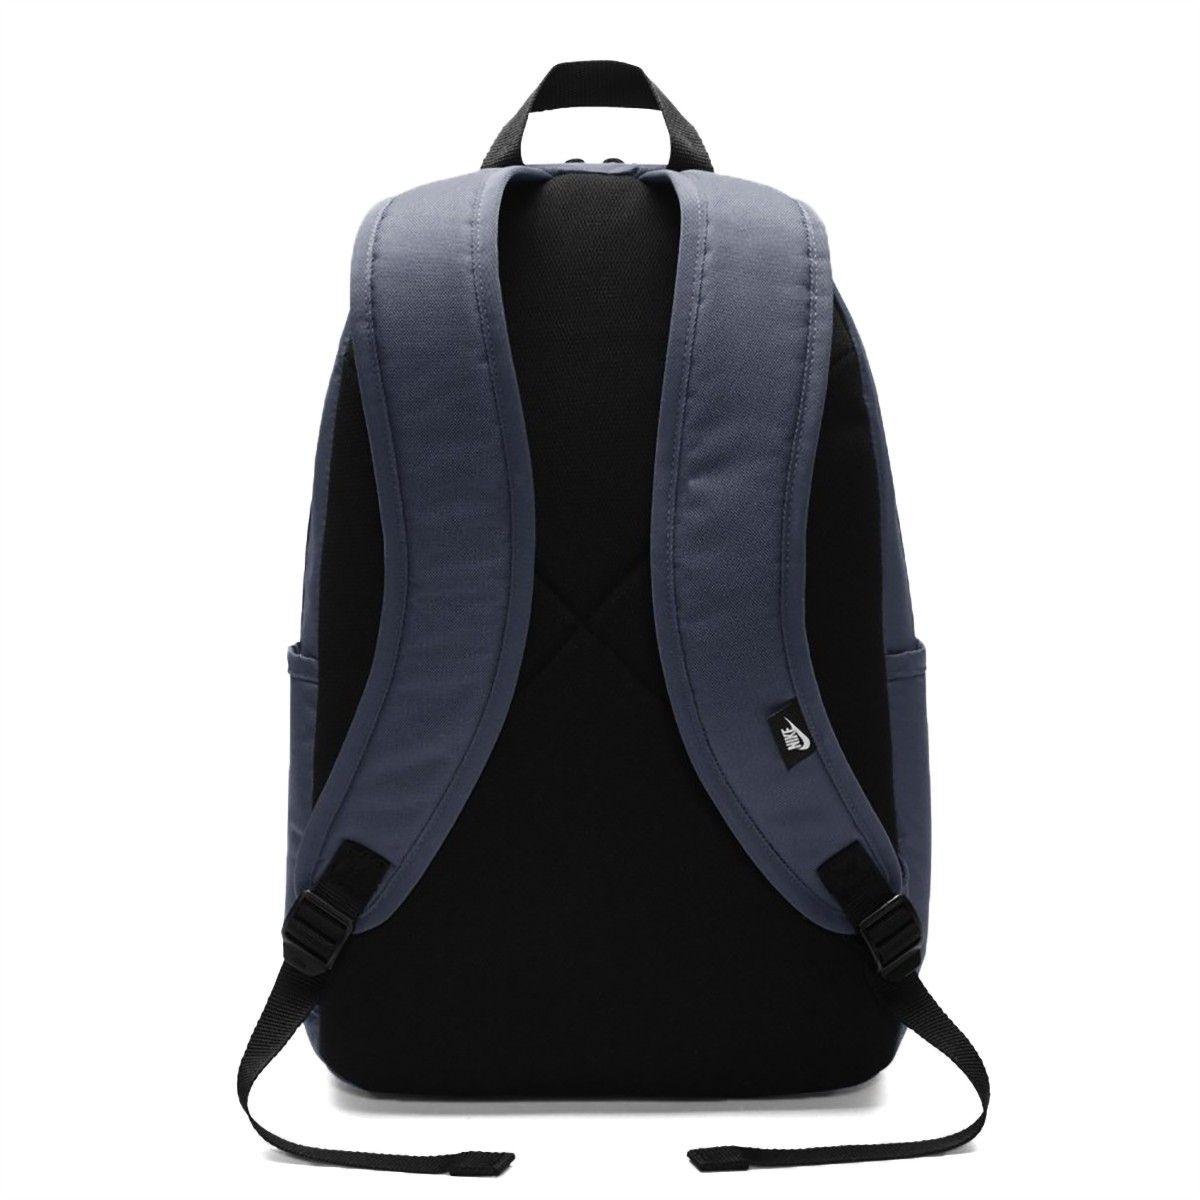 59eac995a7b Раница Nike Sportswear Elemental Backpack